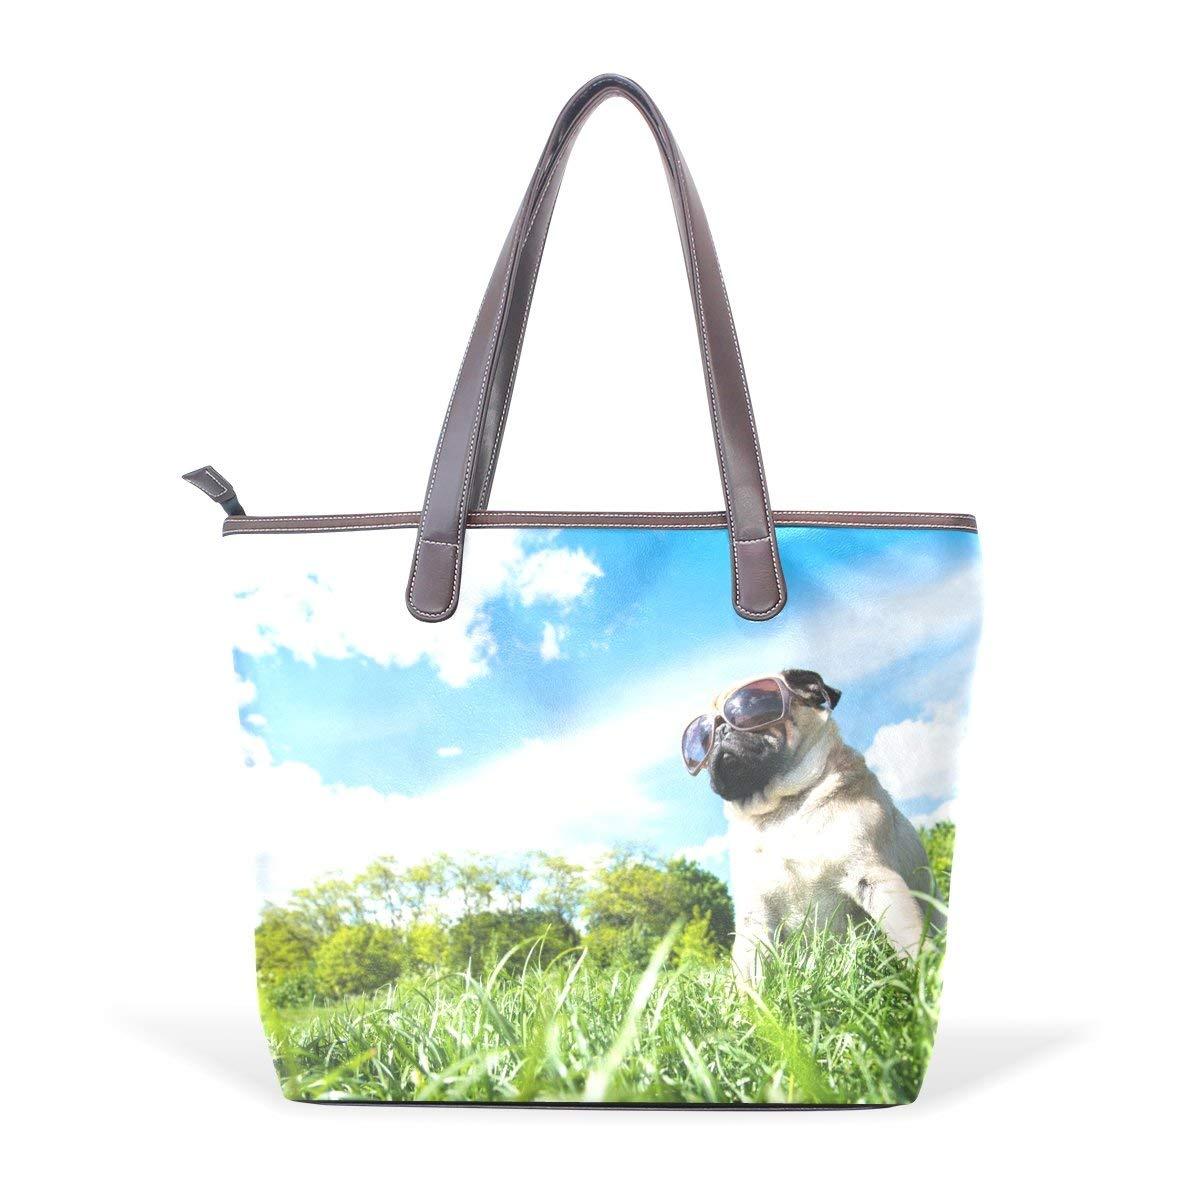 3c71607868 Get Quotations · Dragon Sword Cool Pug Dog Mops Women Handbags Hobo  Shoulder Bags Tote PU Leather Handbags Fashion